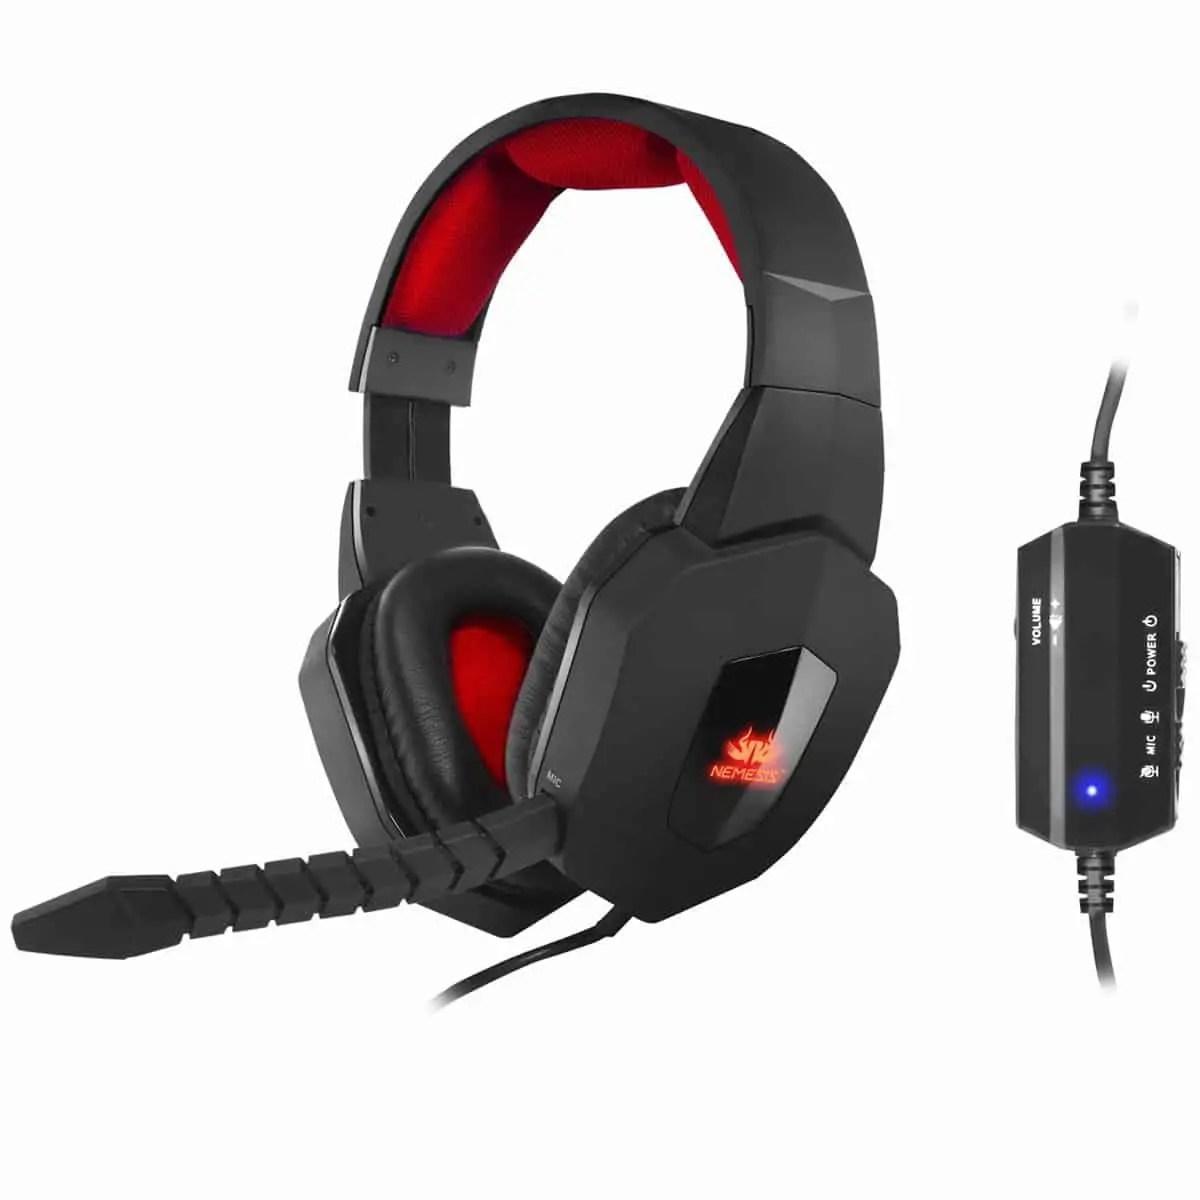 Sumvision Nemesis Akuma 7.1 Surround Sound Headphones Review